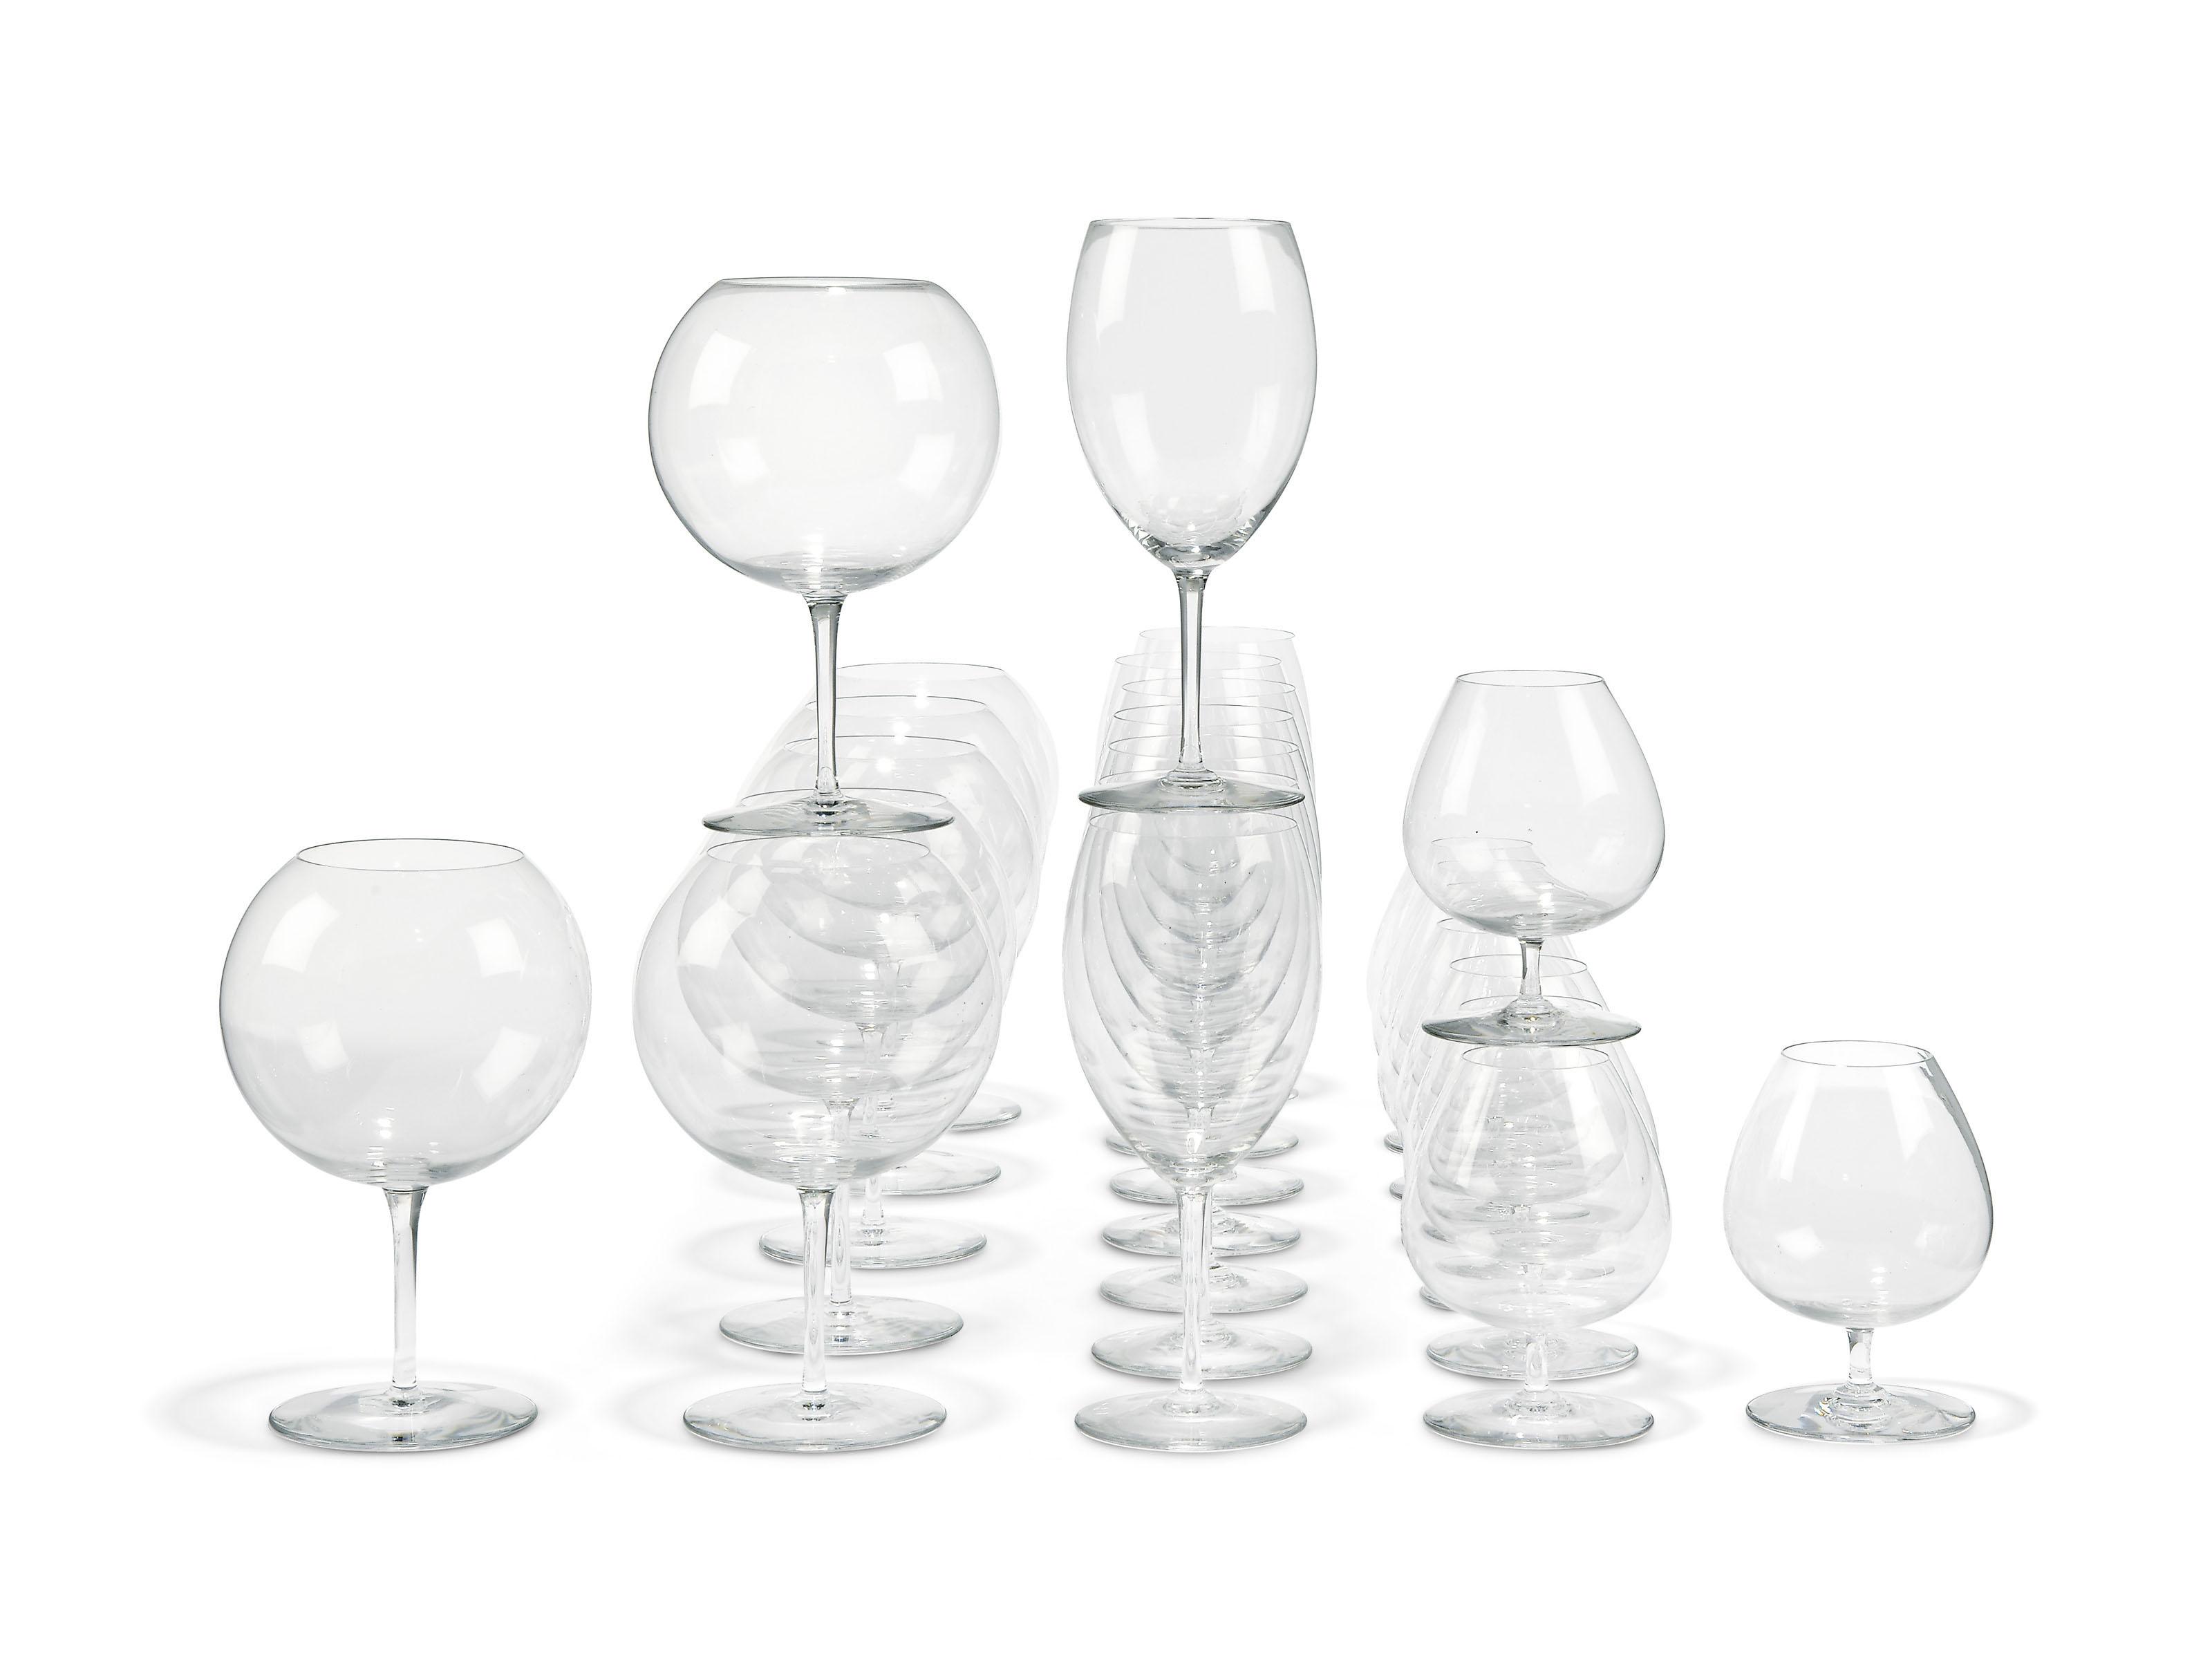 A BACCARAT GLASS PART TABLE-SE